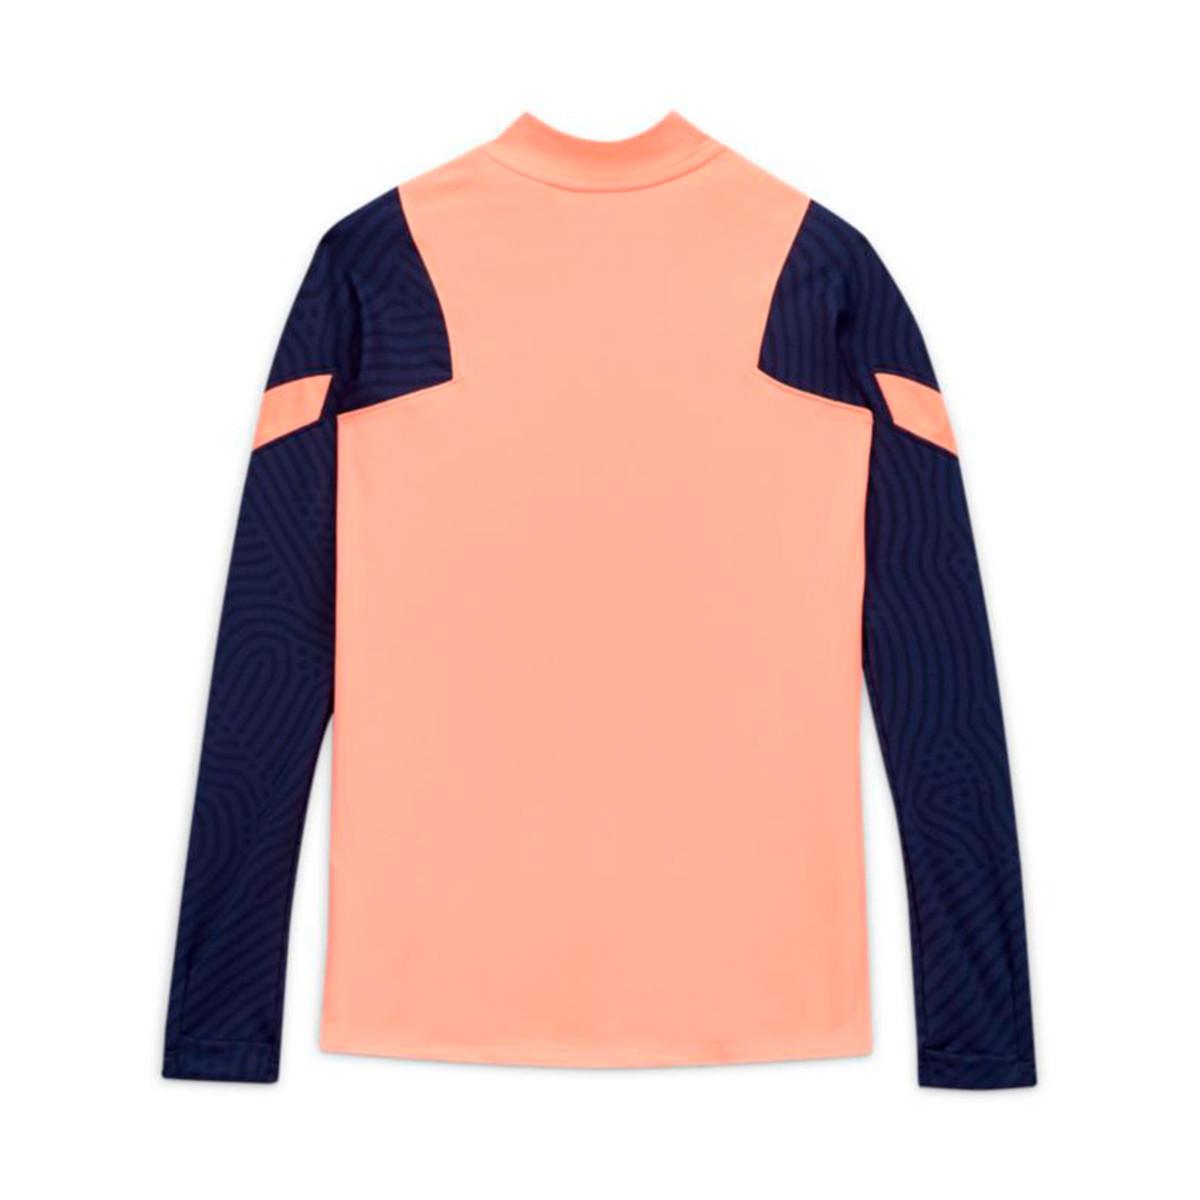 Sweatshirt Nike Tottenham Hotspur Fc Dri Fit Strike Dril Top 2020 2021 Nino Lava Glow Binary Blue Football Store Futbol Emotion